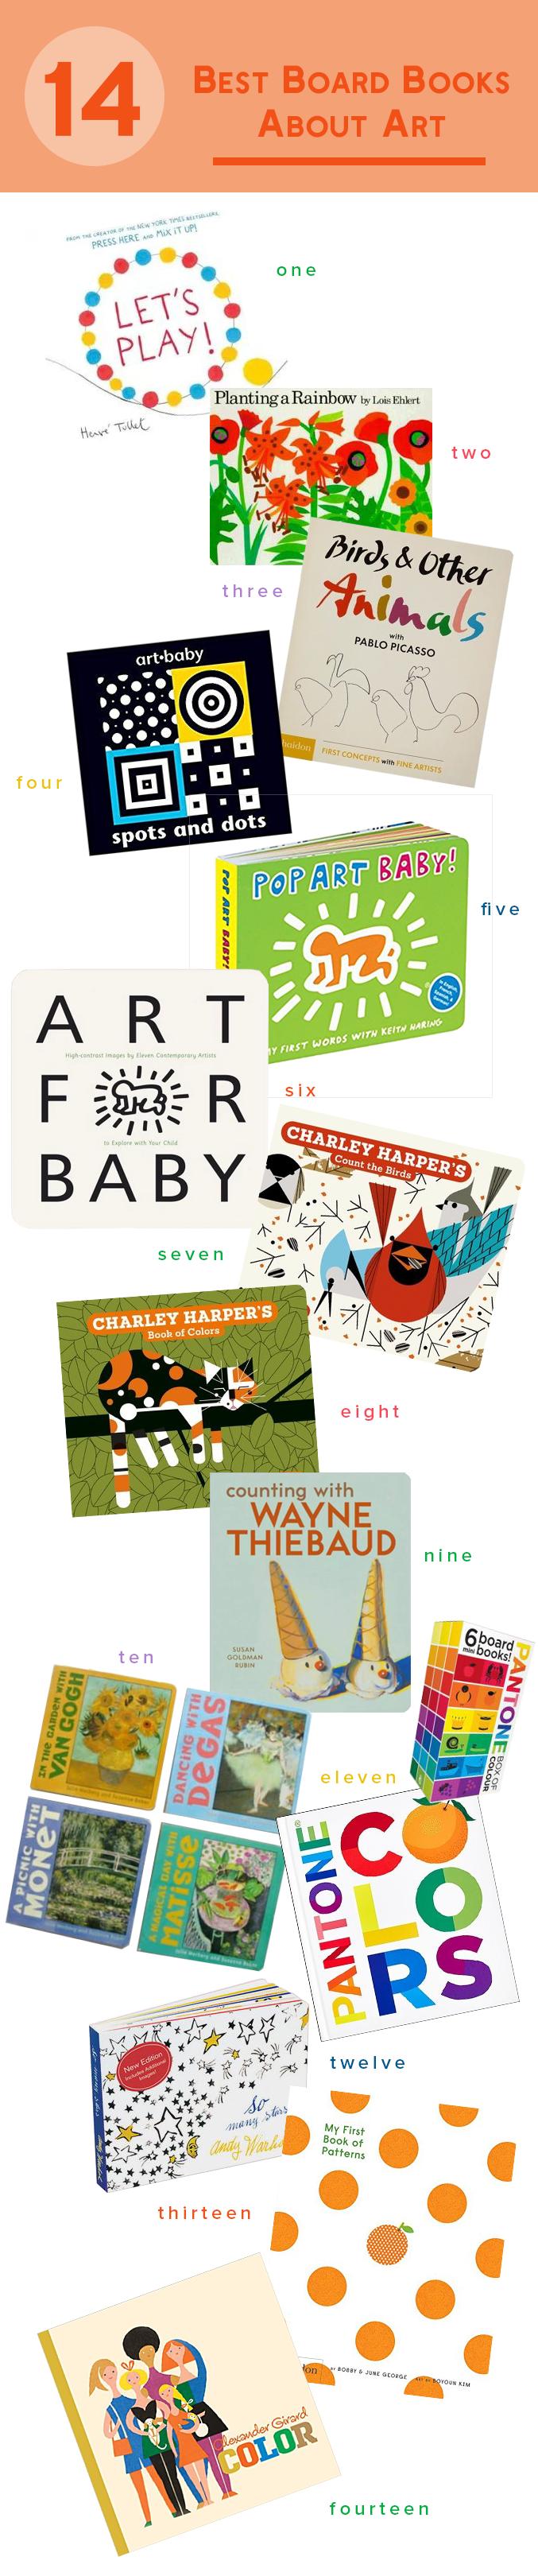 Artful board books for babies